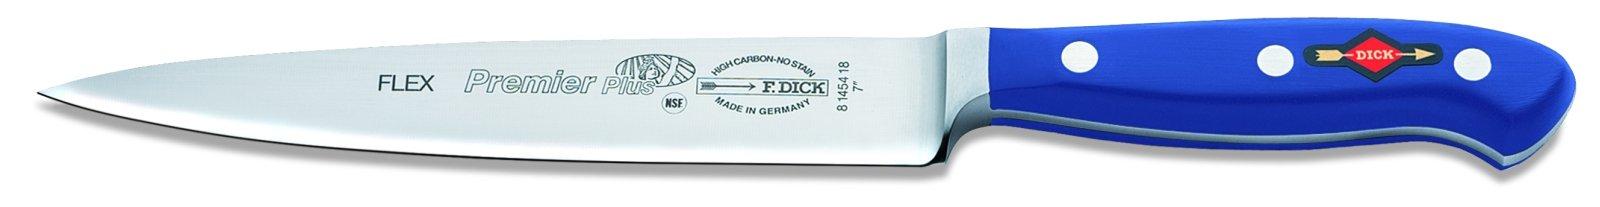 Friedr. Dick Premier Plus HACCP 7-Inch Fillet Knife, Flexible